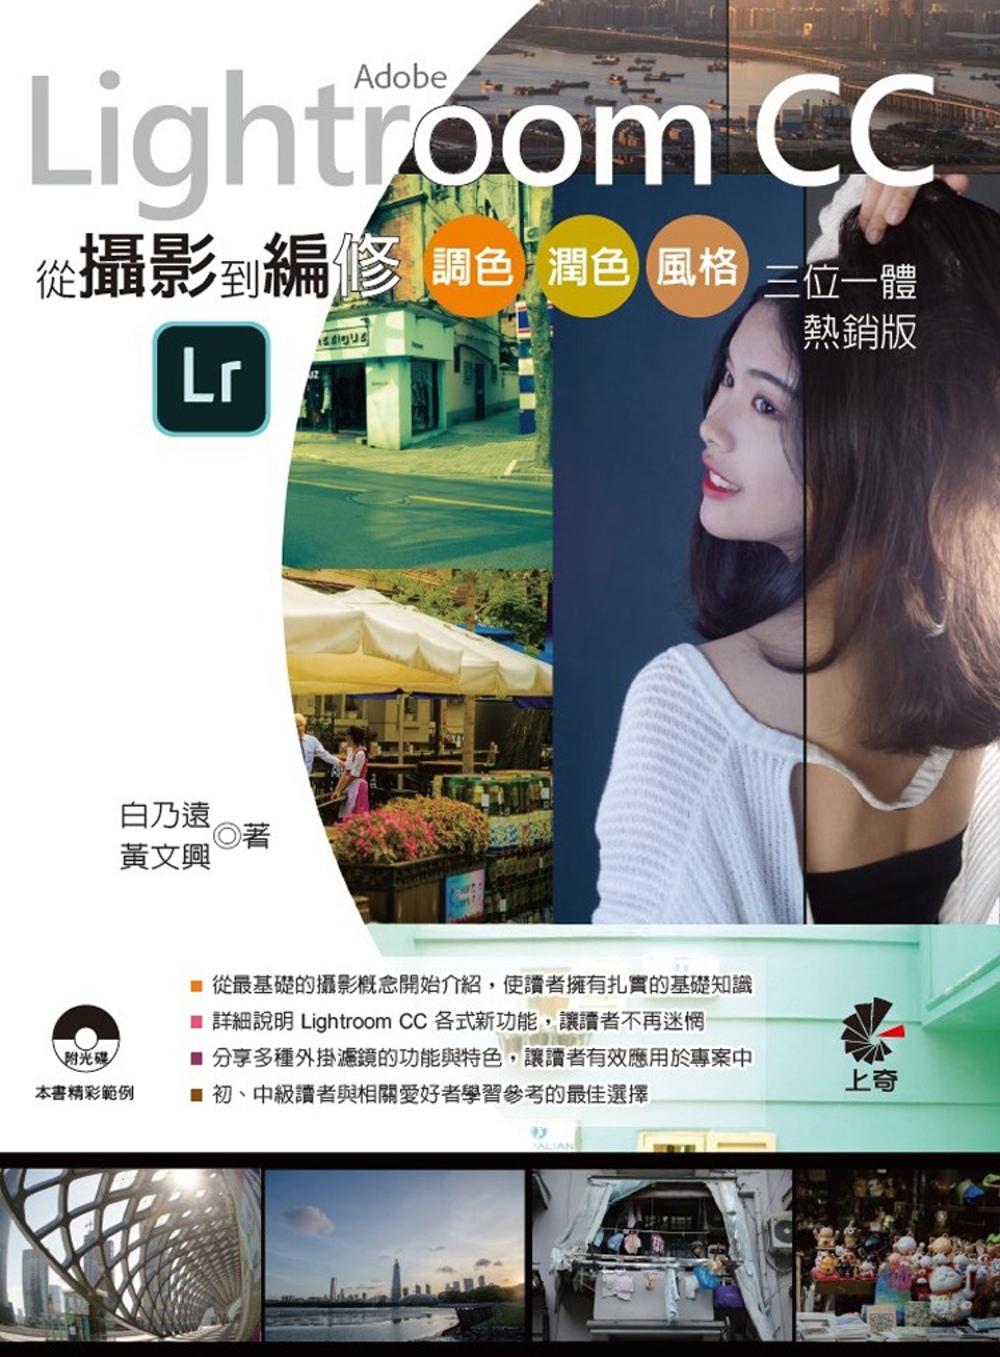 Adobe Lightroom CC 從攝影到編修:調色、潤色、風格、三位一體(熱銷版)